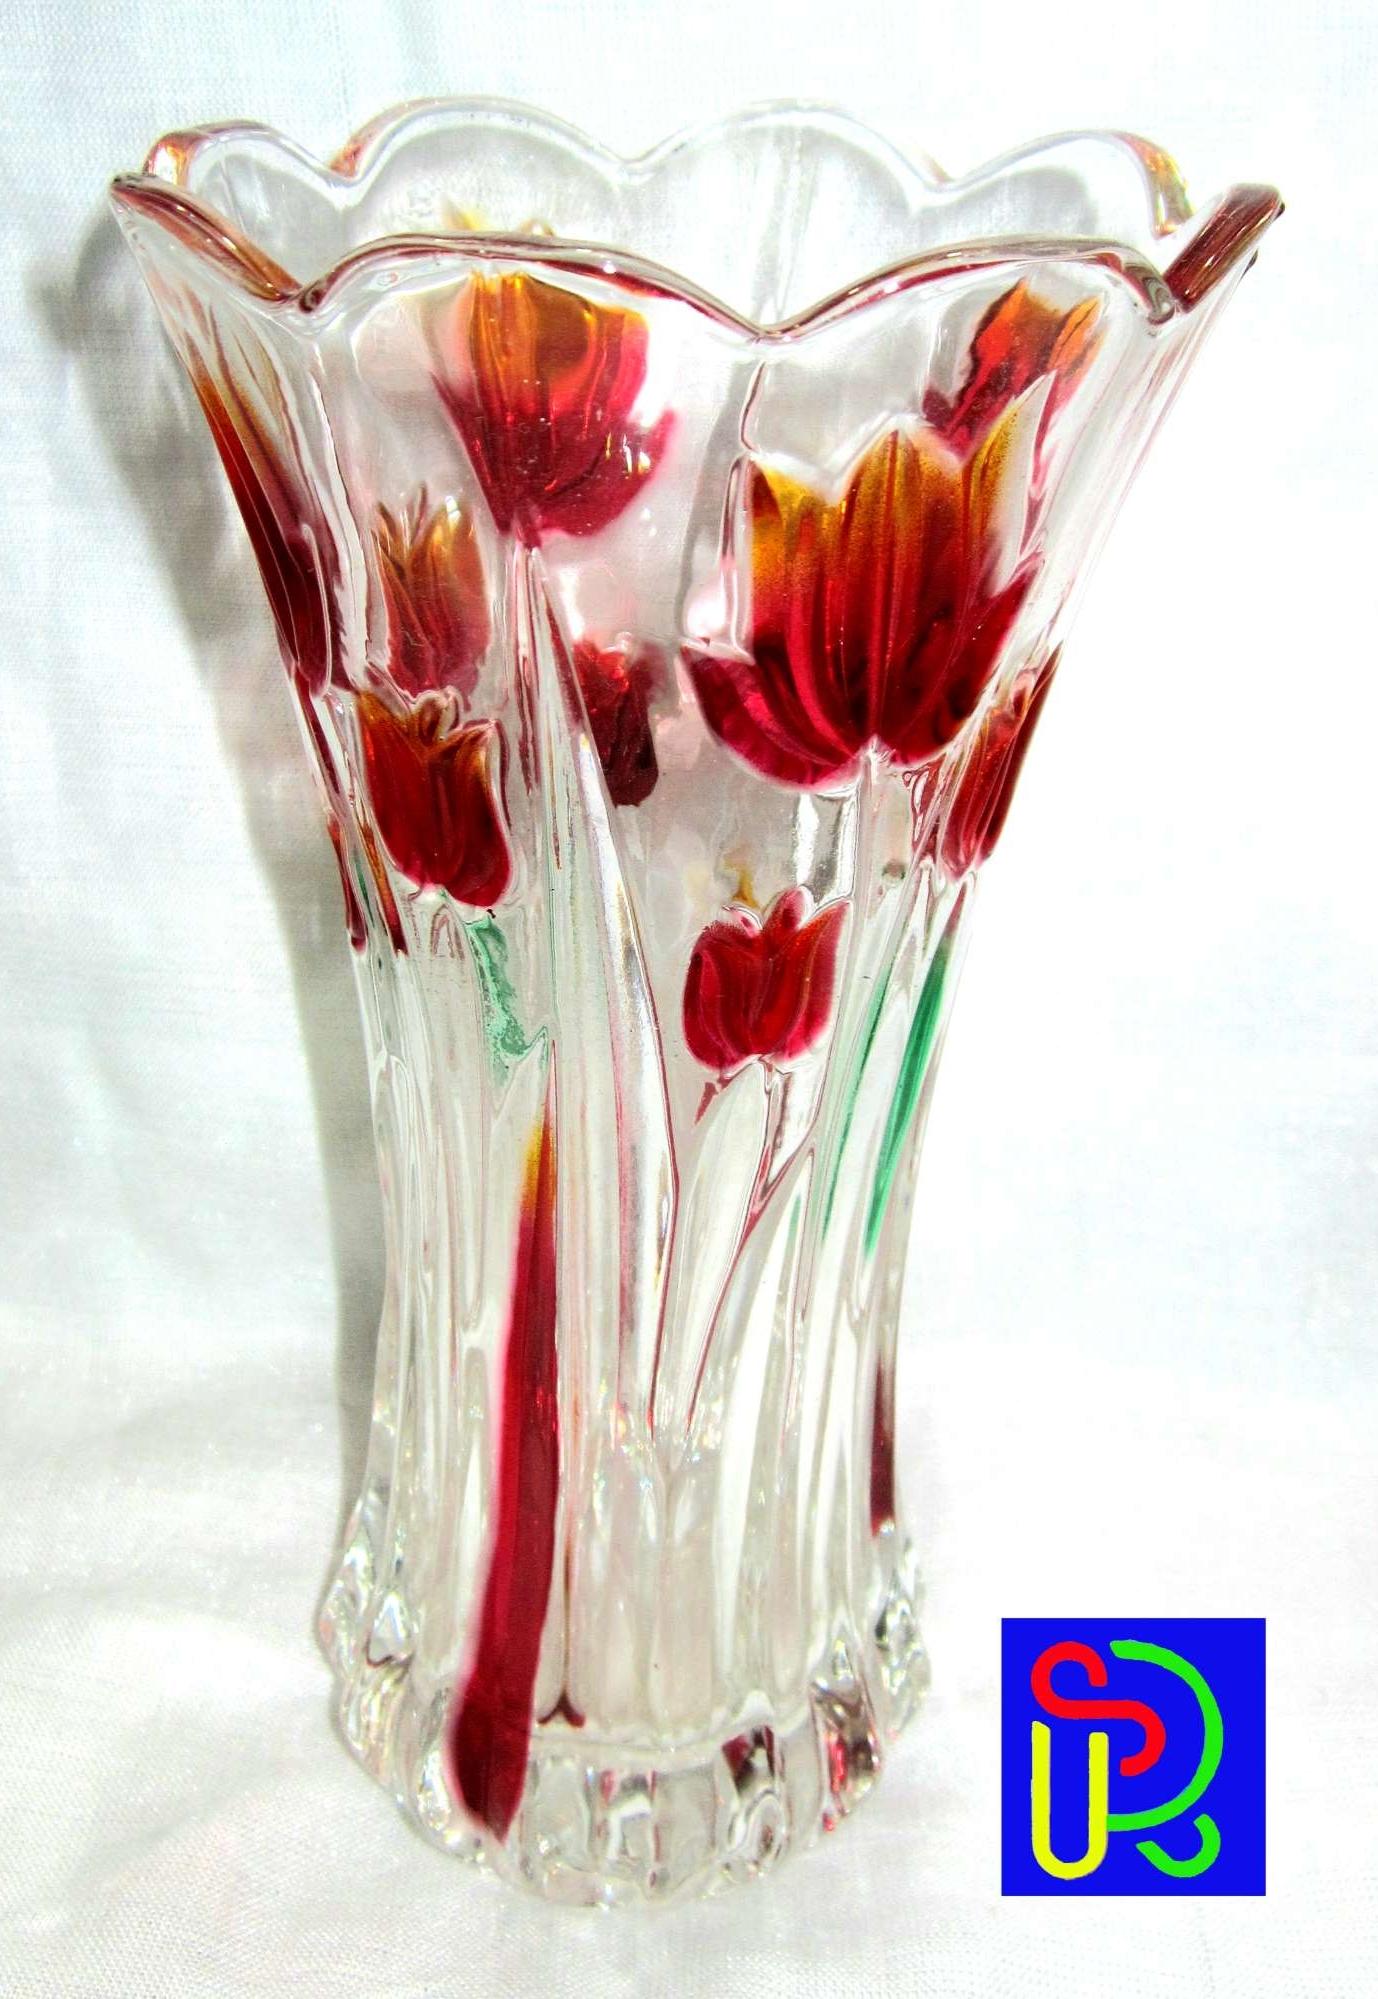 Crystal Glass Decor Flower Vase Buy Online At Best Prices In Bangladesh Daraz Com Bd